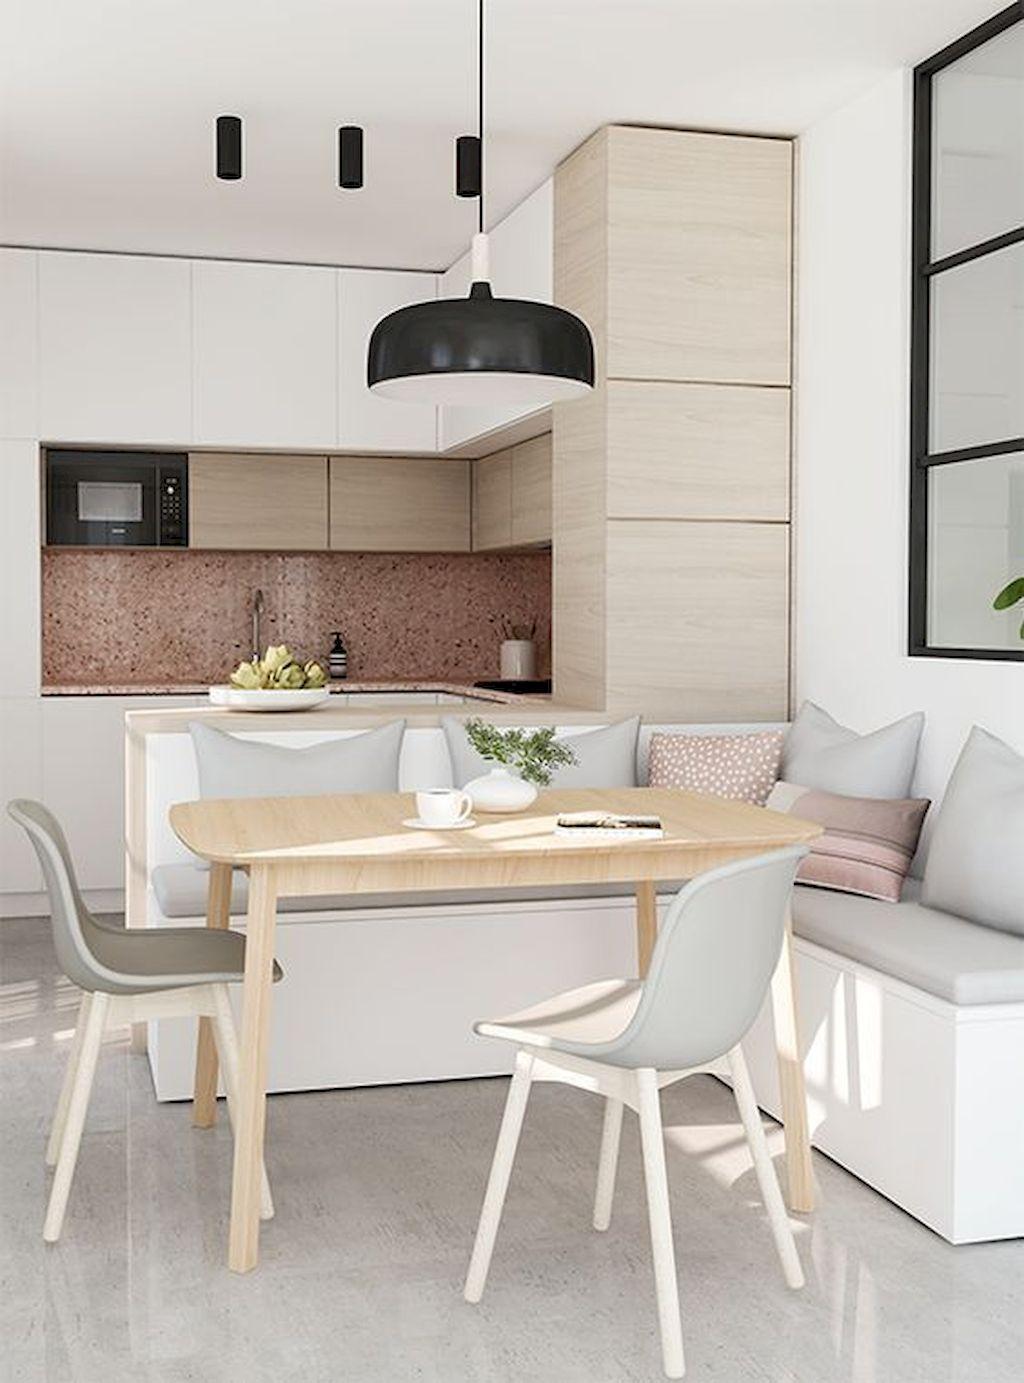 Appartement Diningroom149